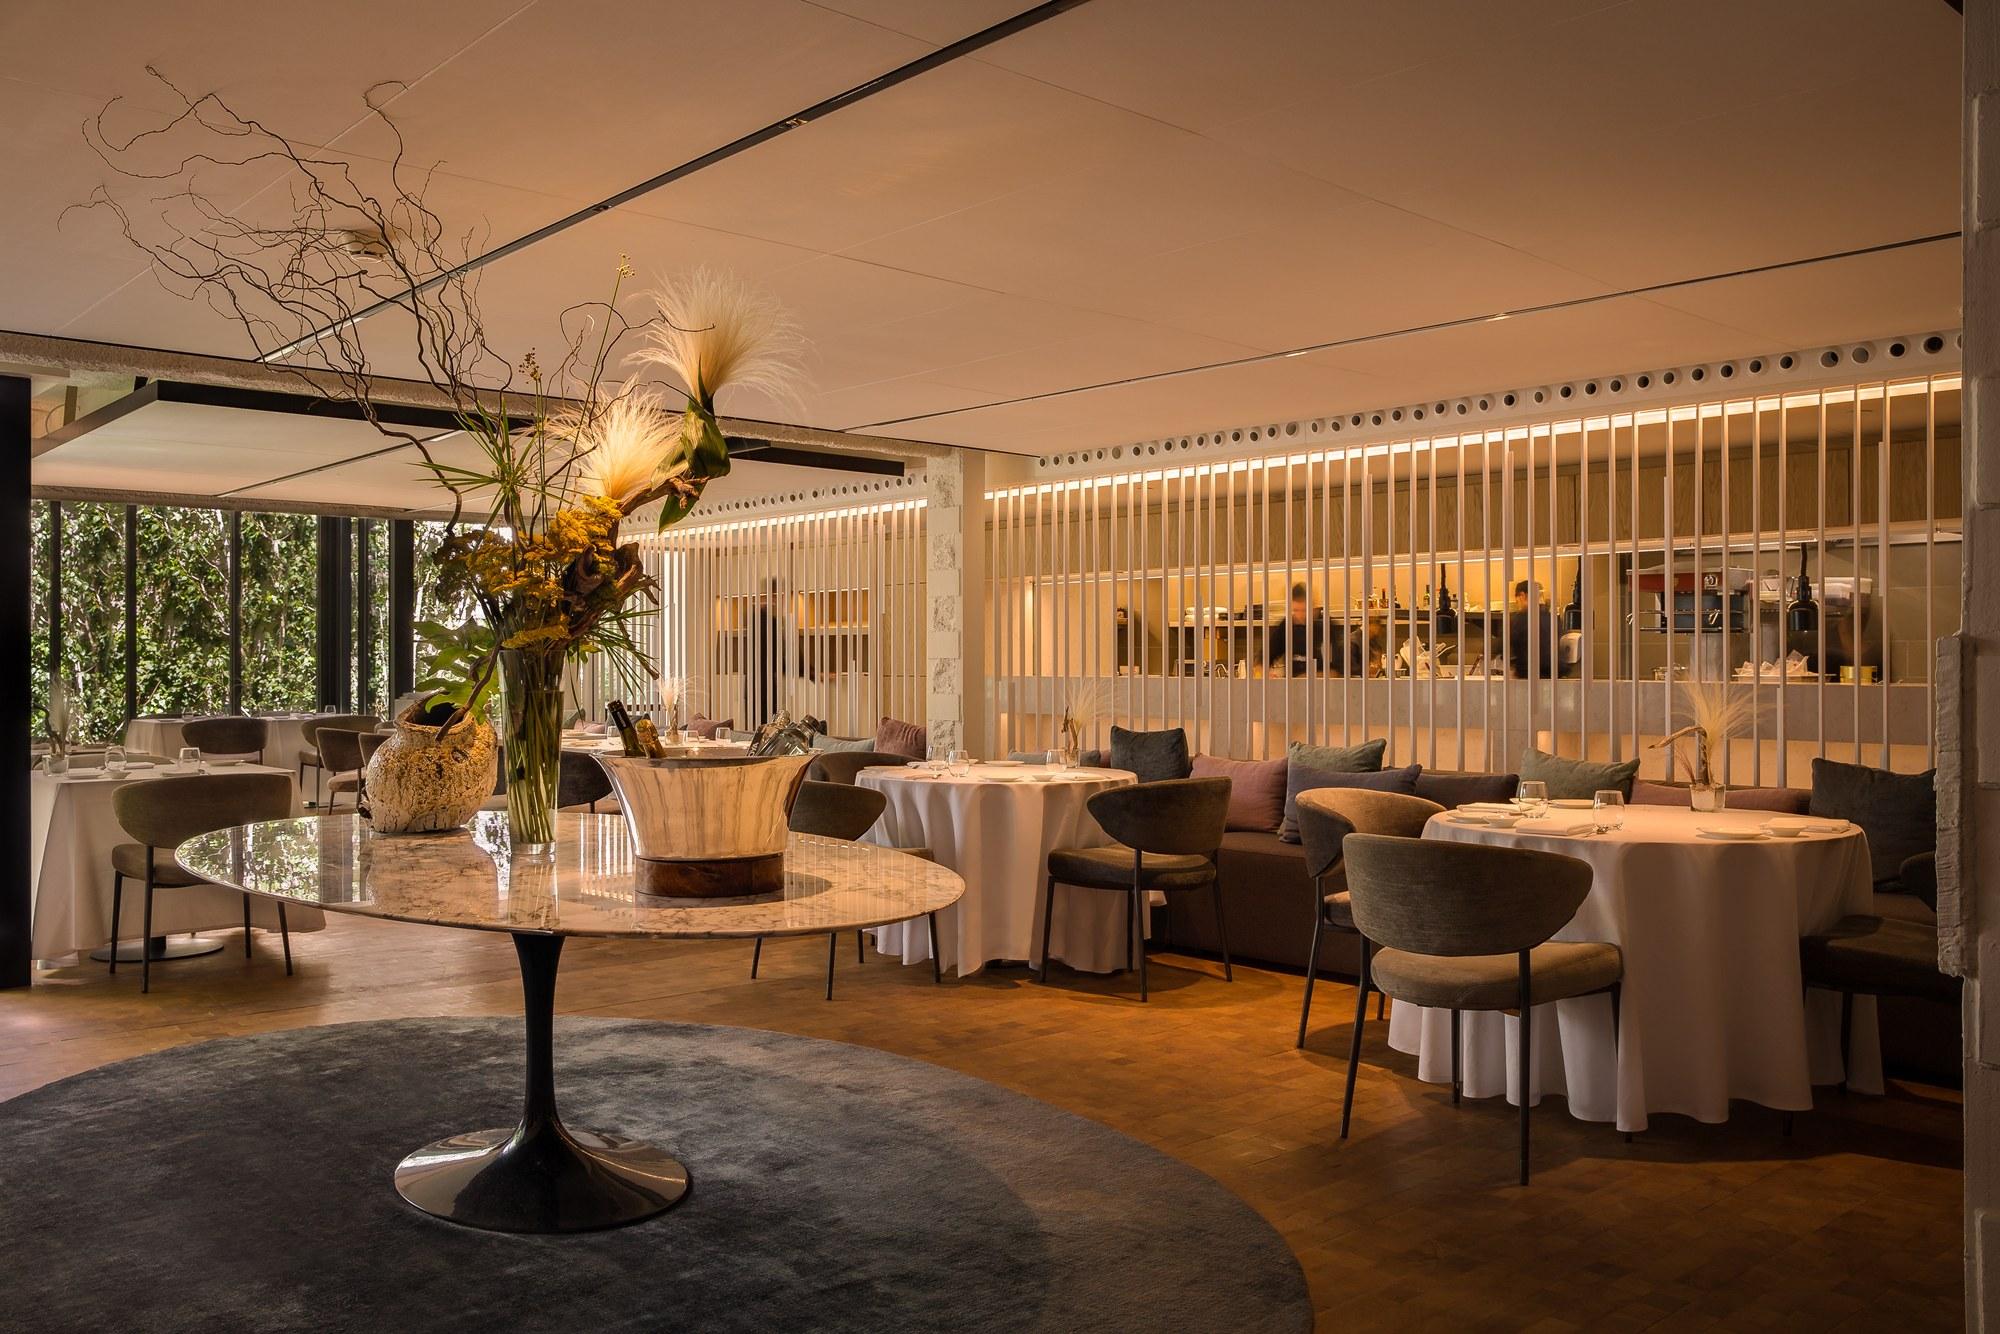 xerta-restaurant-barcelona-restaurante-ohla-eixample-fran-lopez